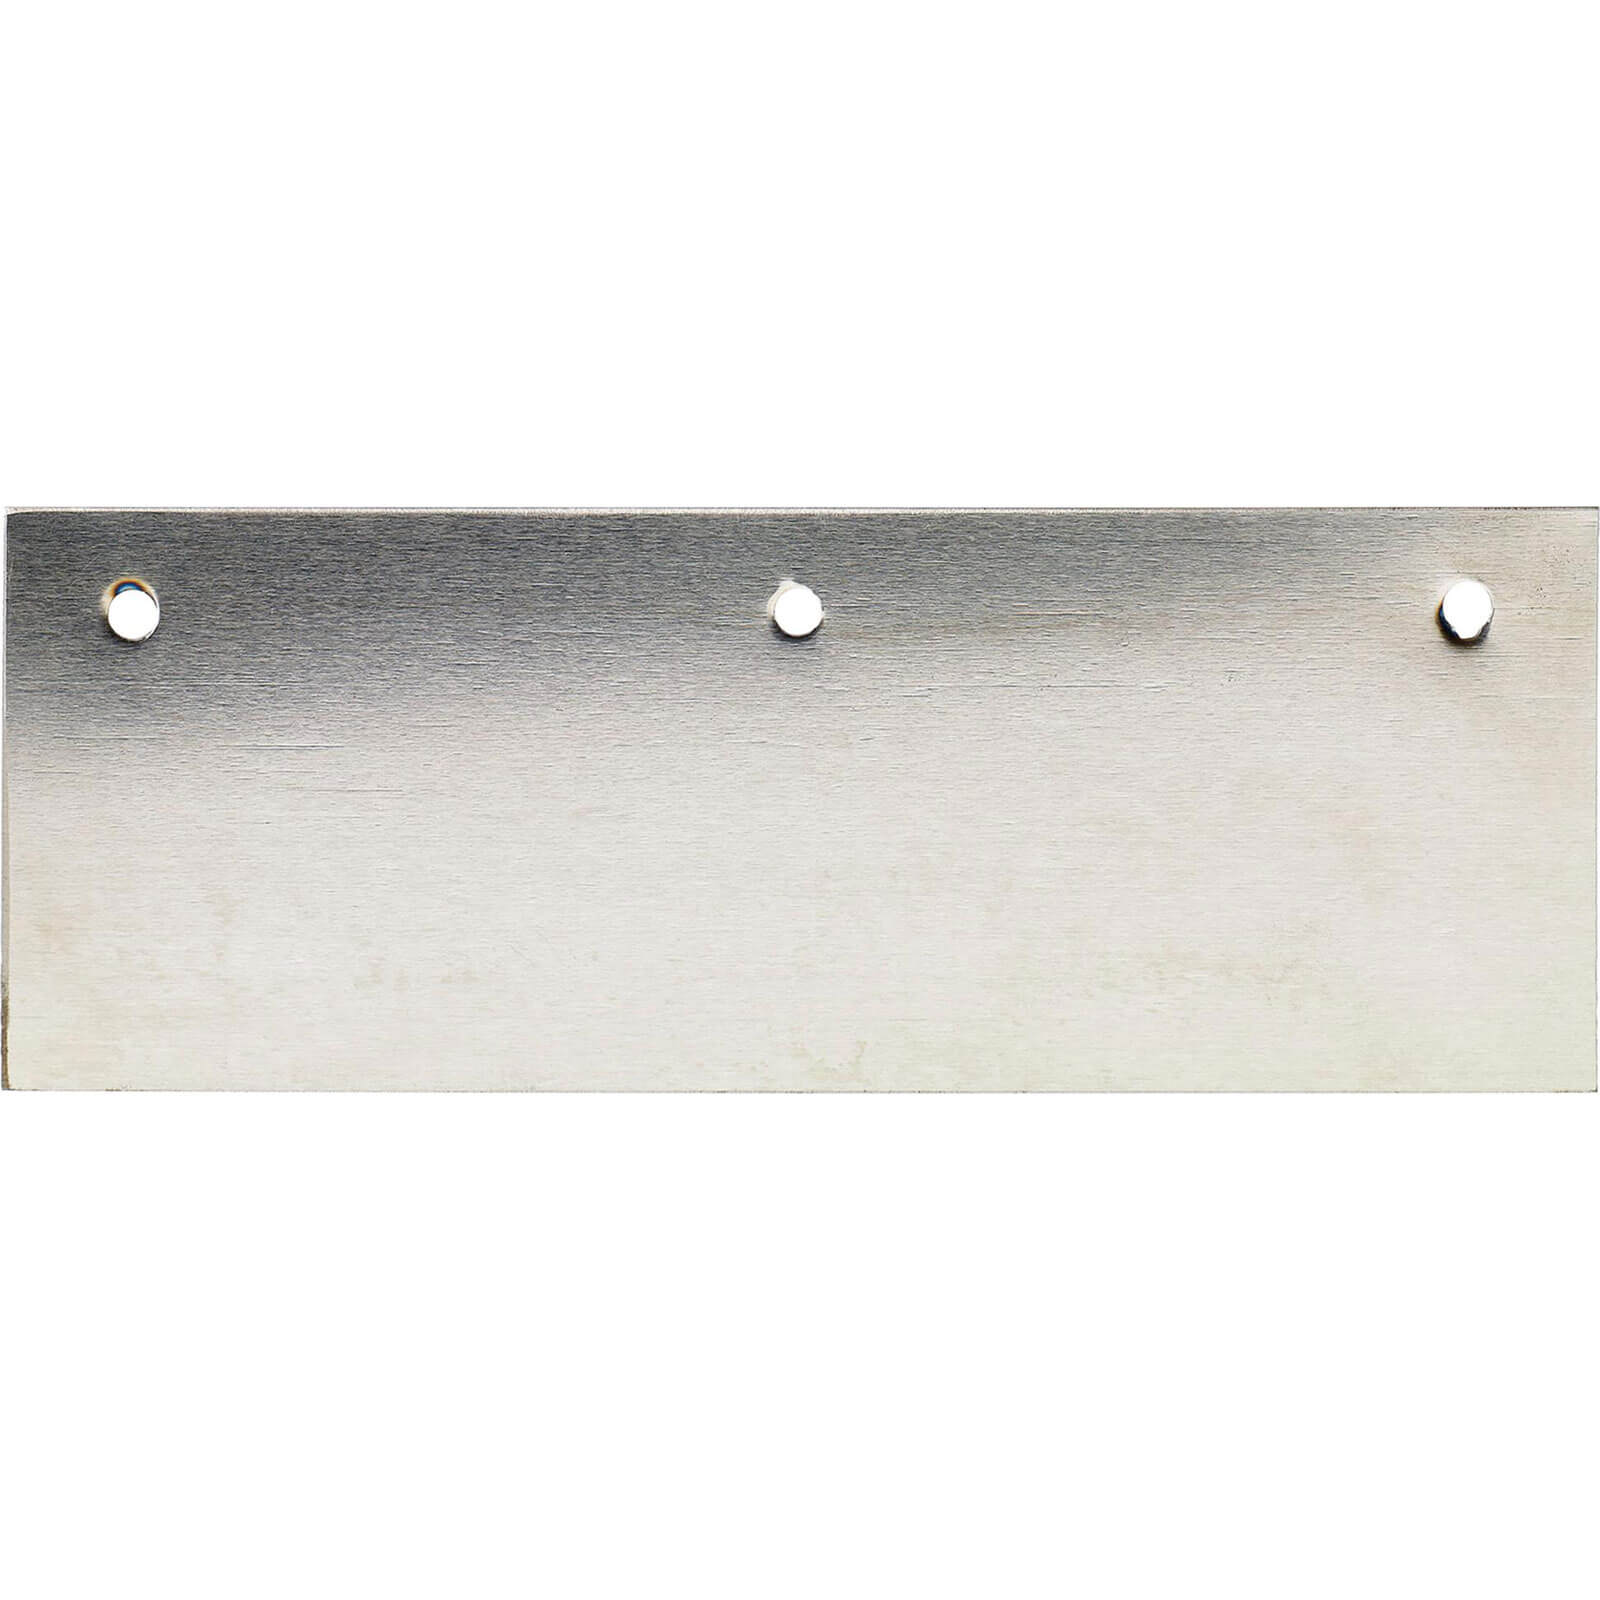 Image of Bulldog Blade for 1190 Premier Floor Scraper 200mm